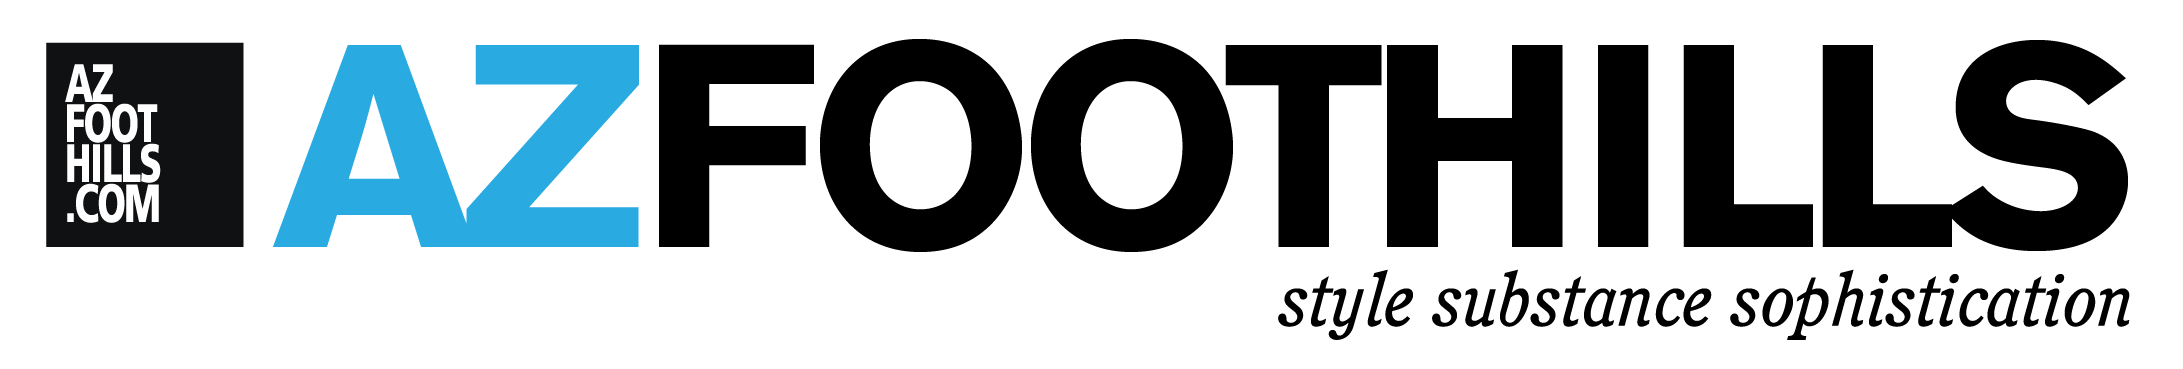 azfoothills_2014_logo_-06.png